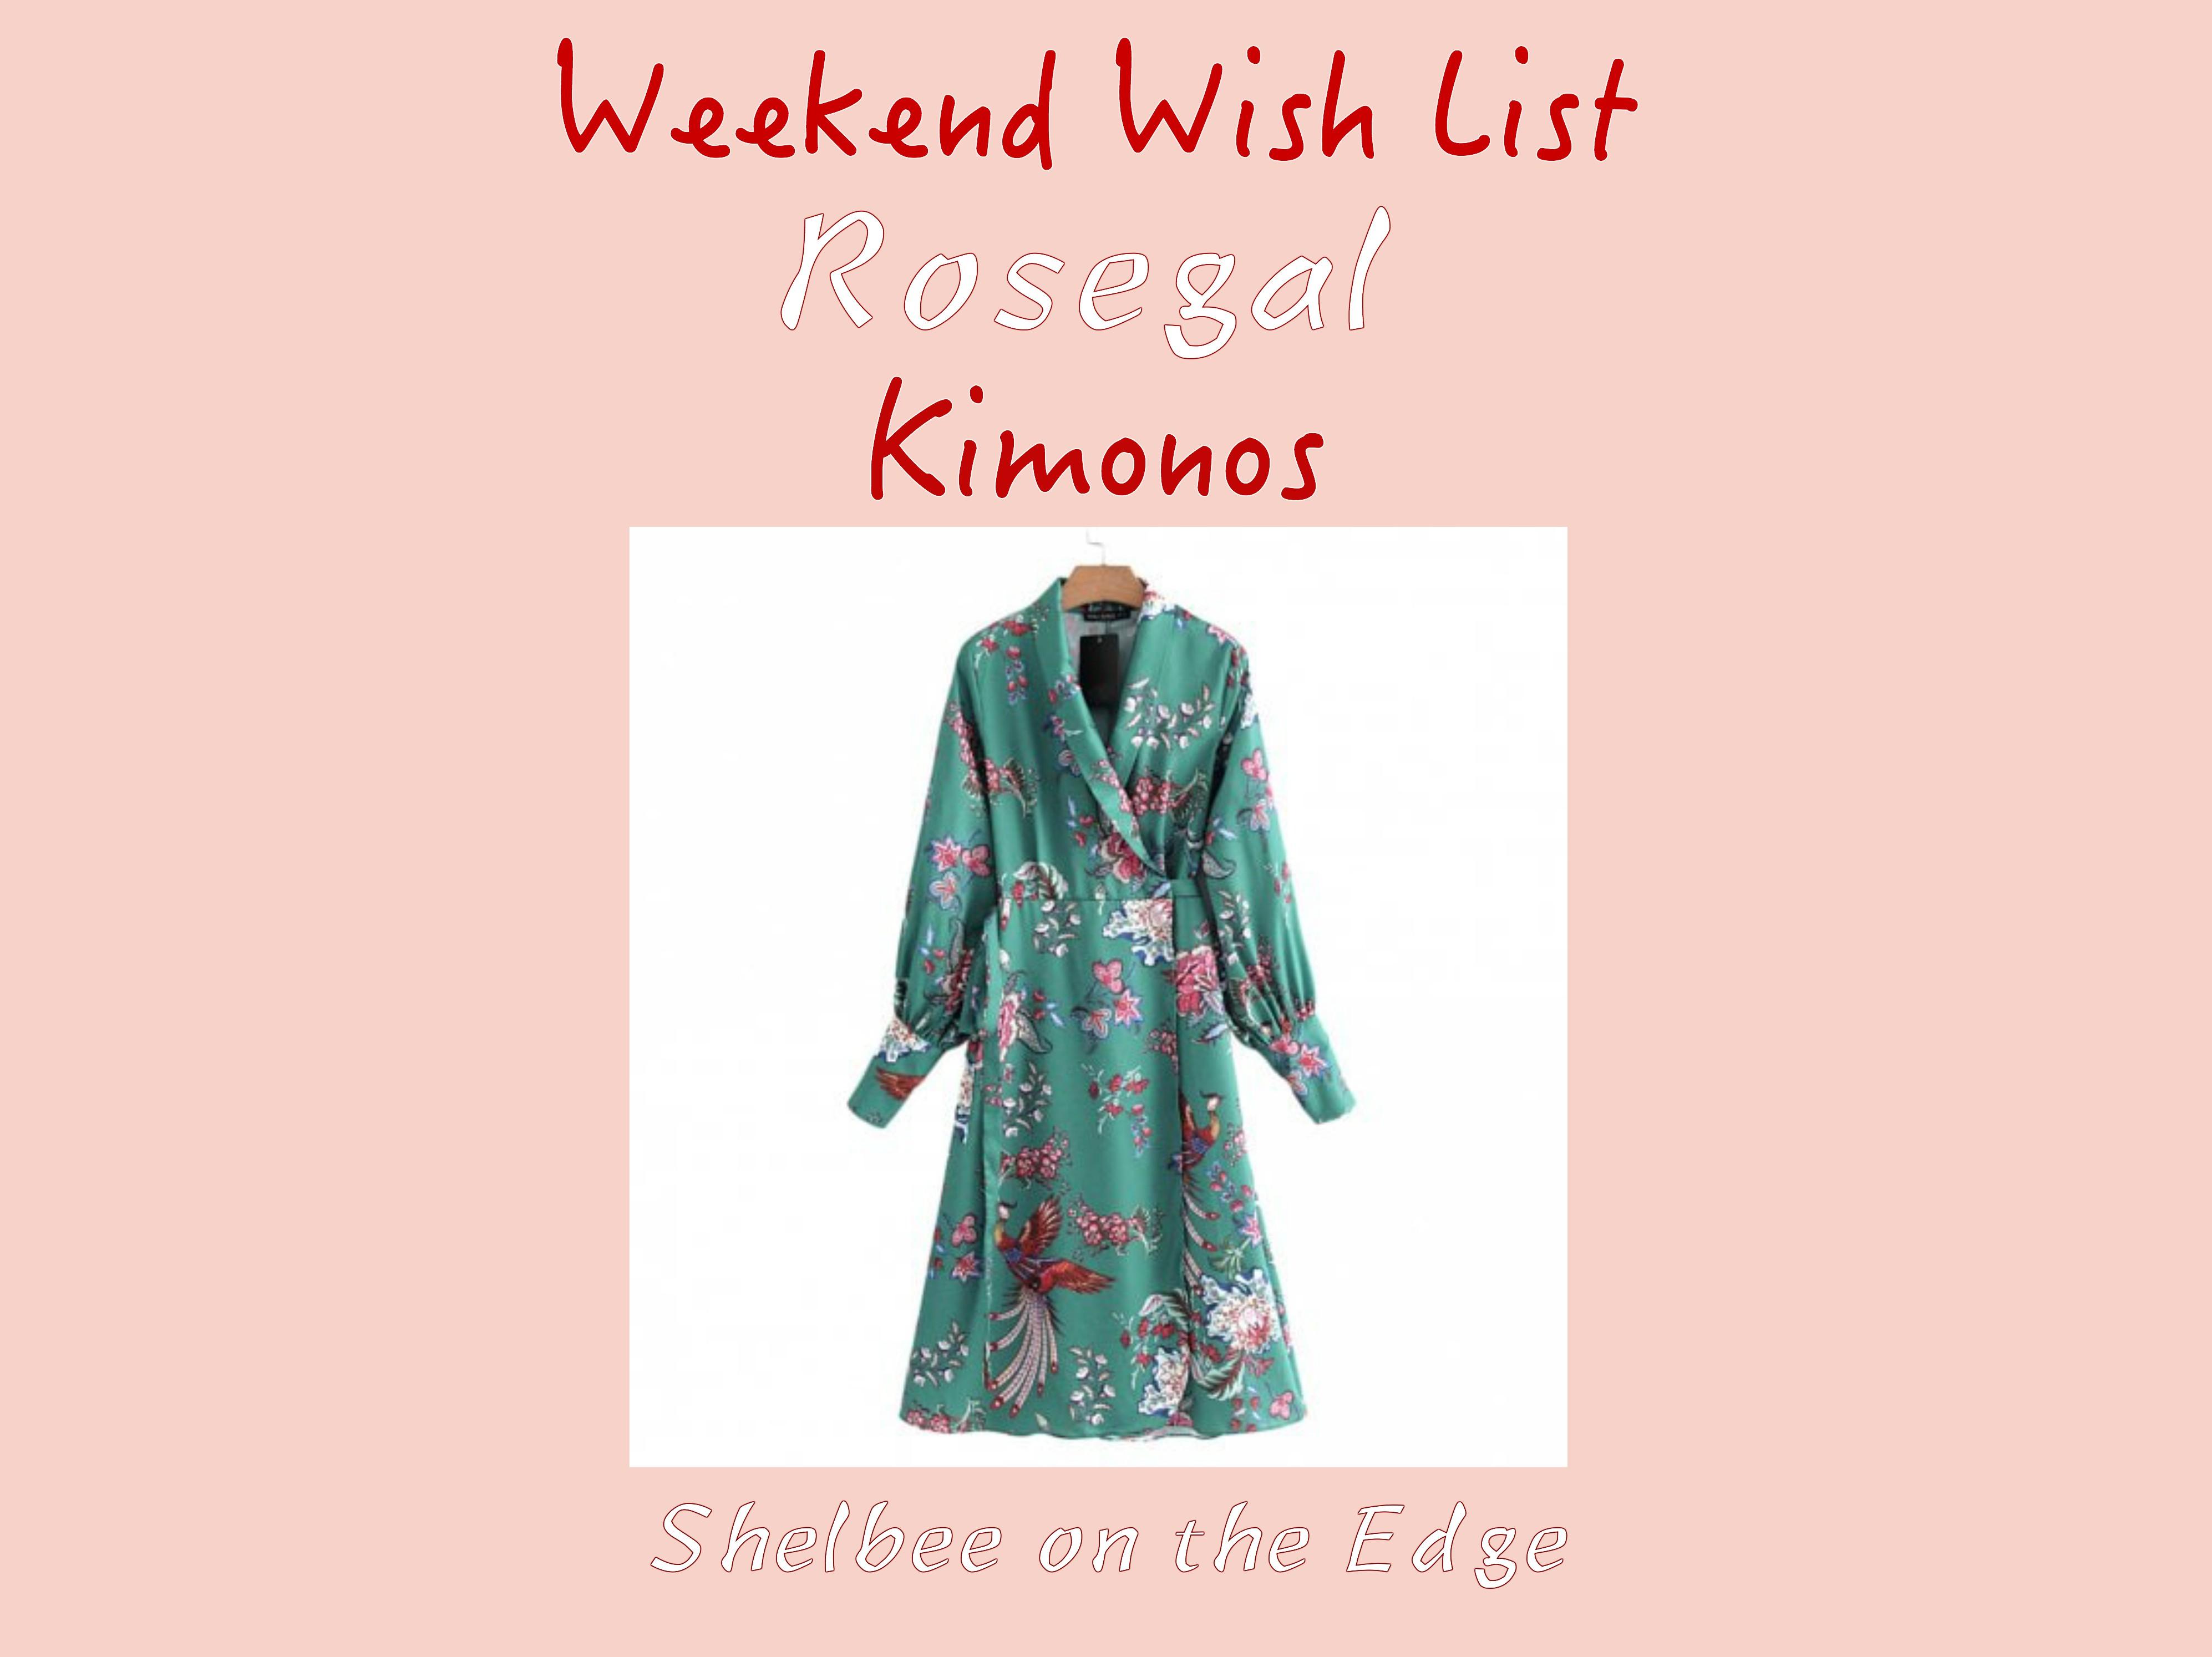 Weekend Wish List: Rosegal Kimonos